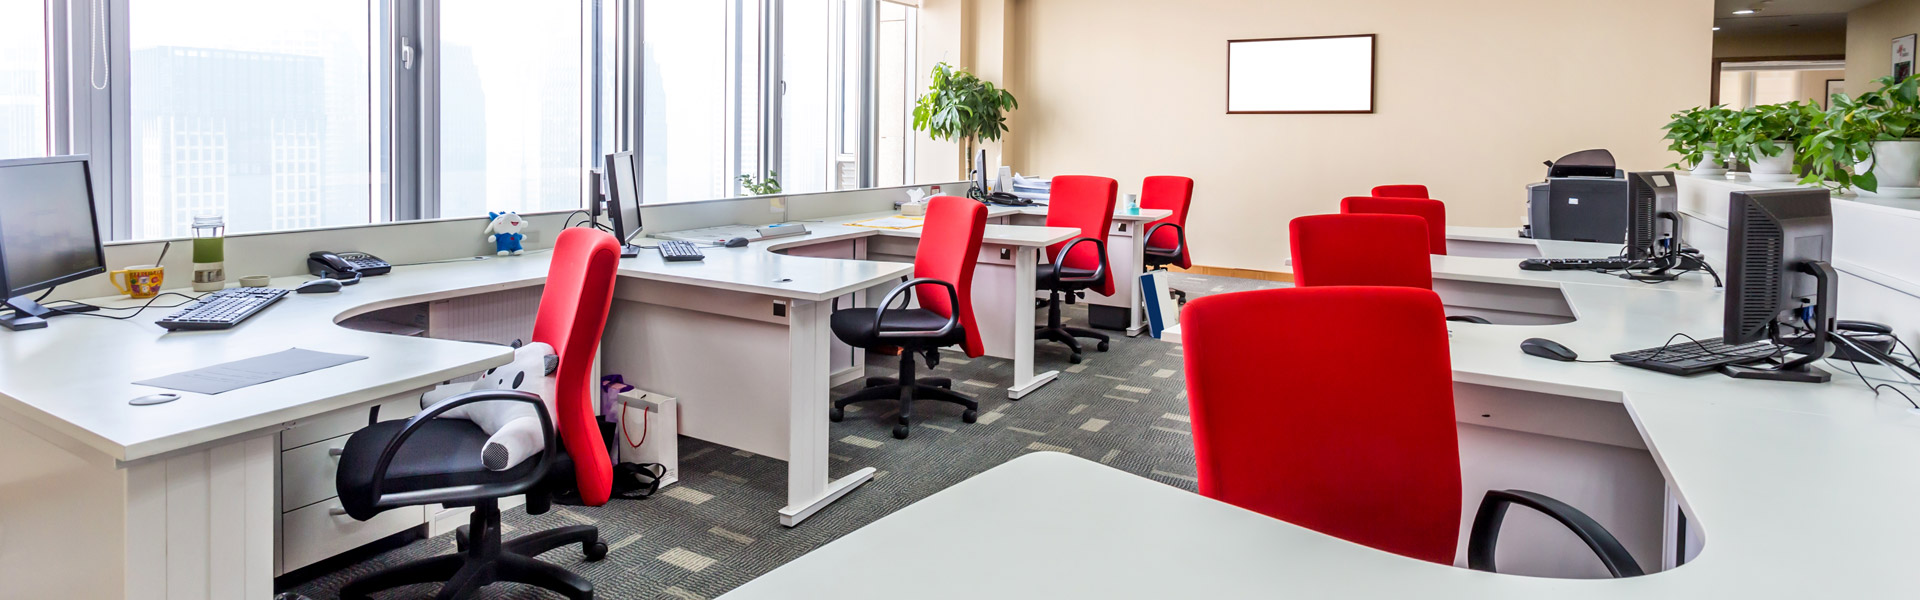 GFI General Furniture Installation